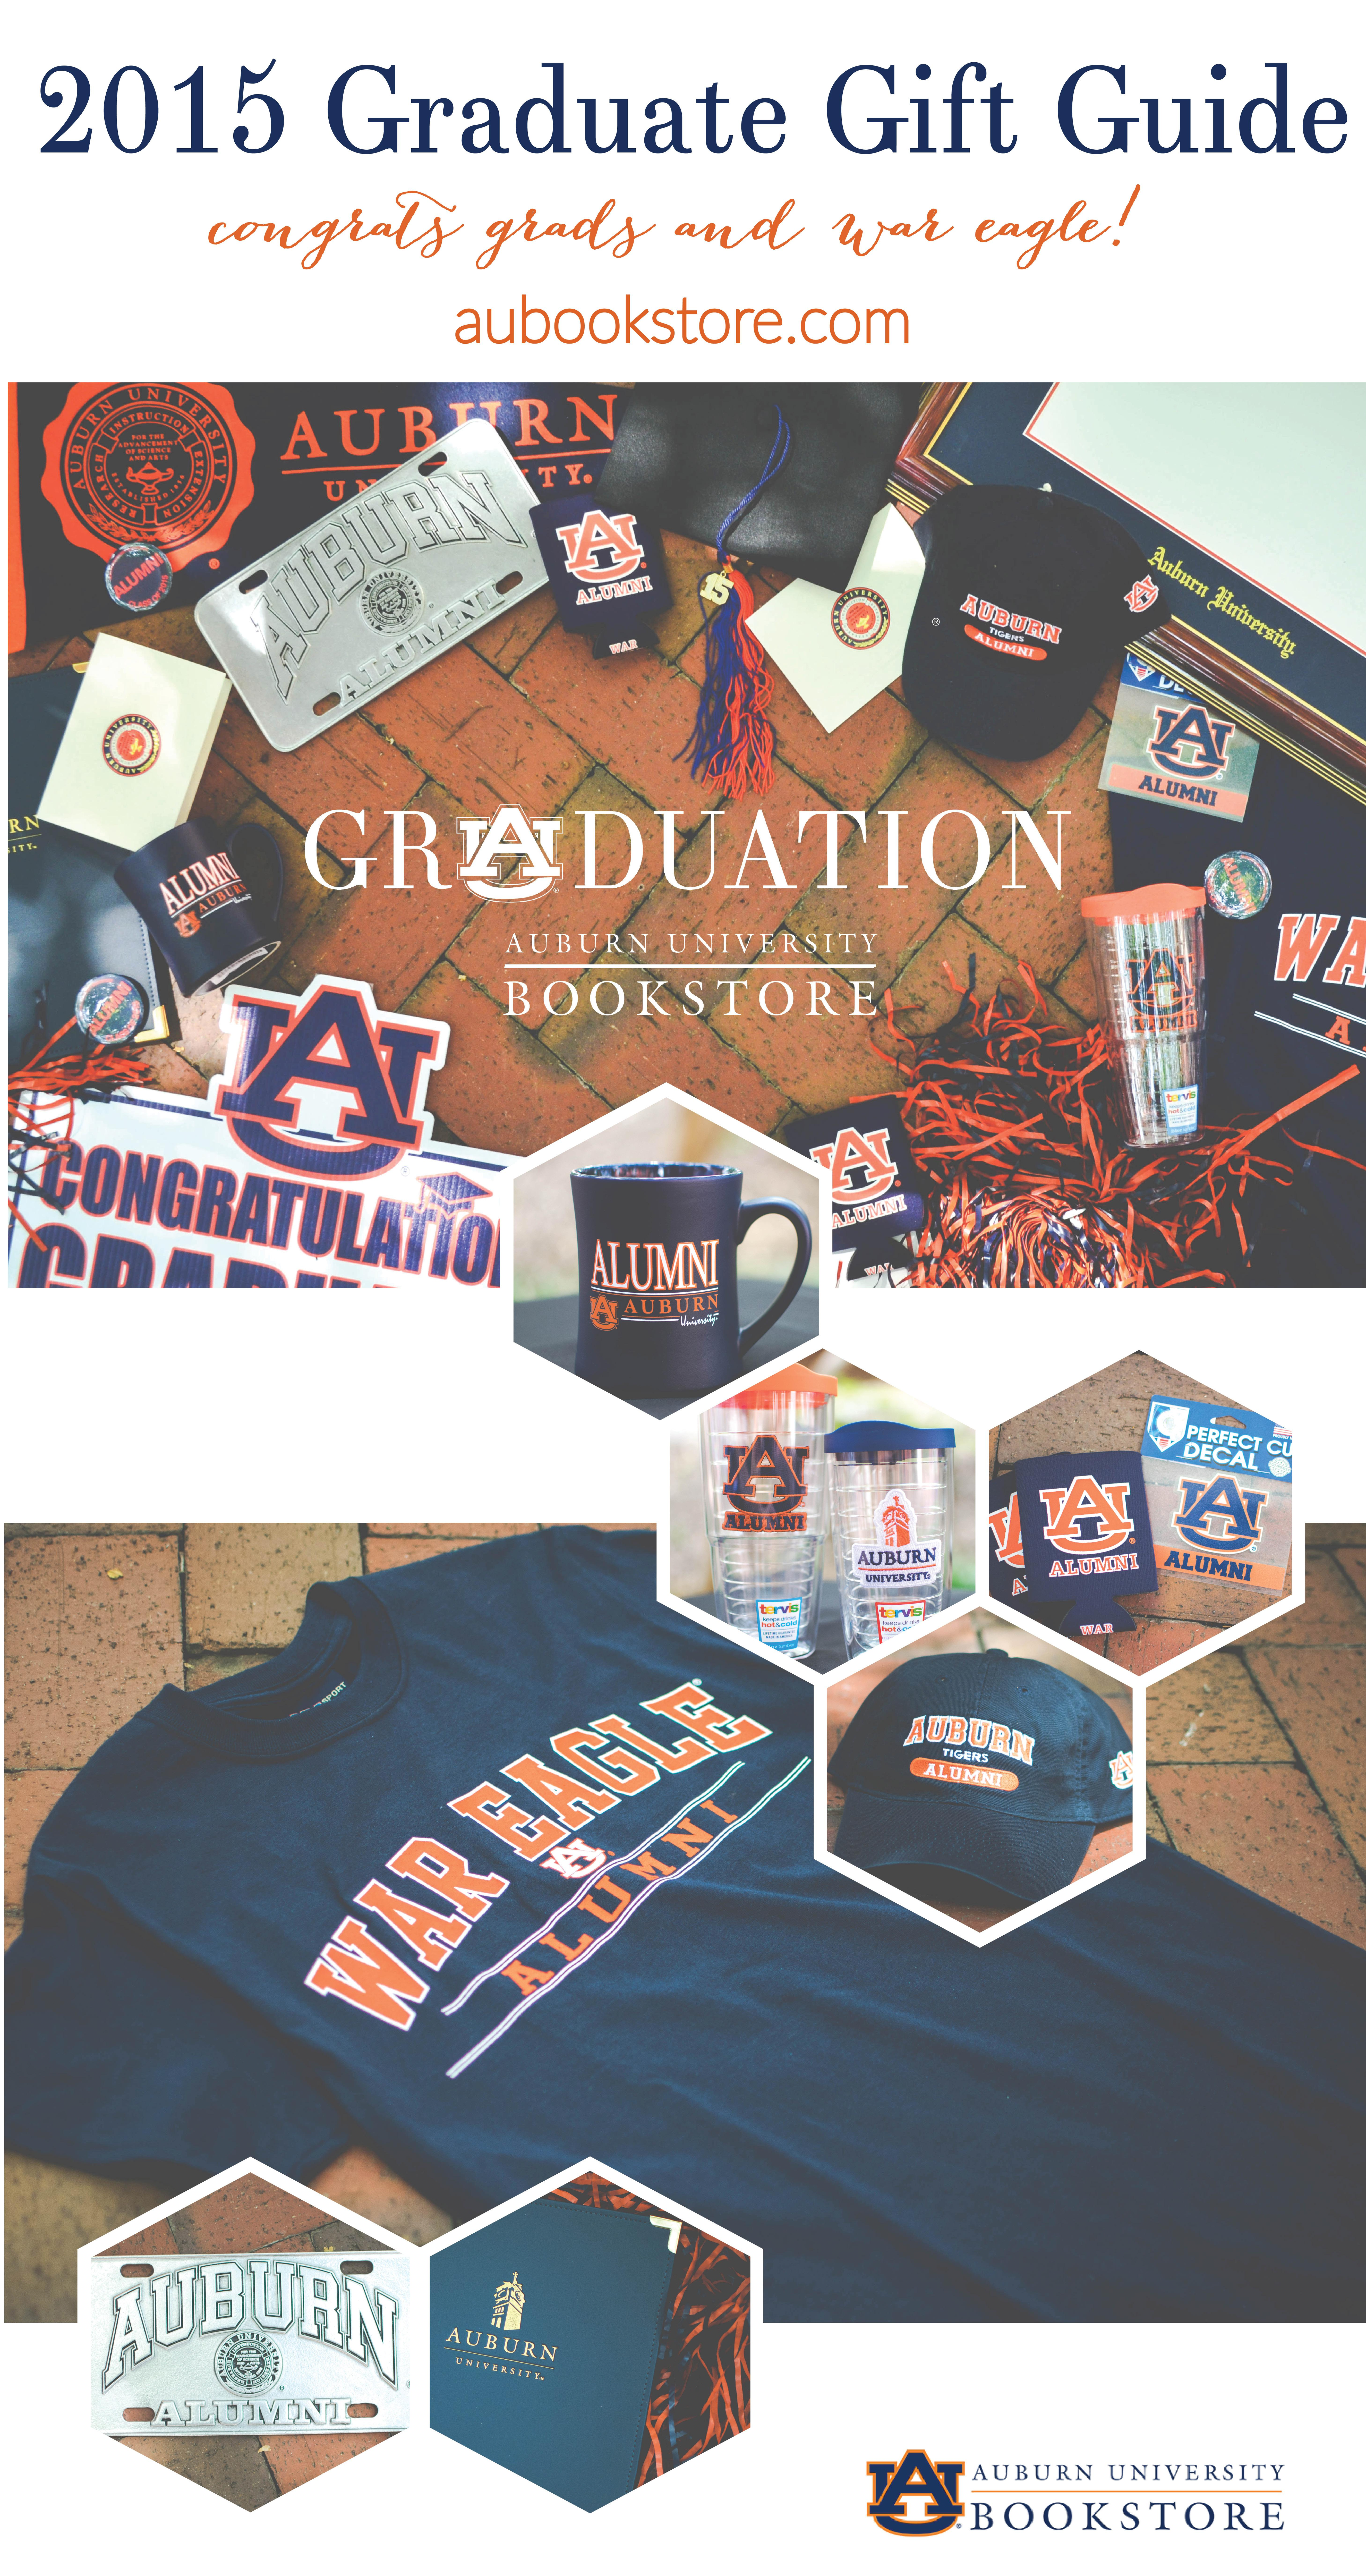 2015 Graduation Gift Guide